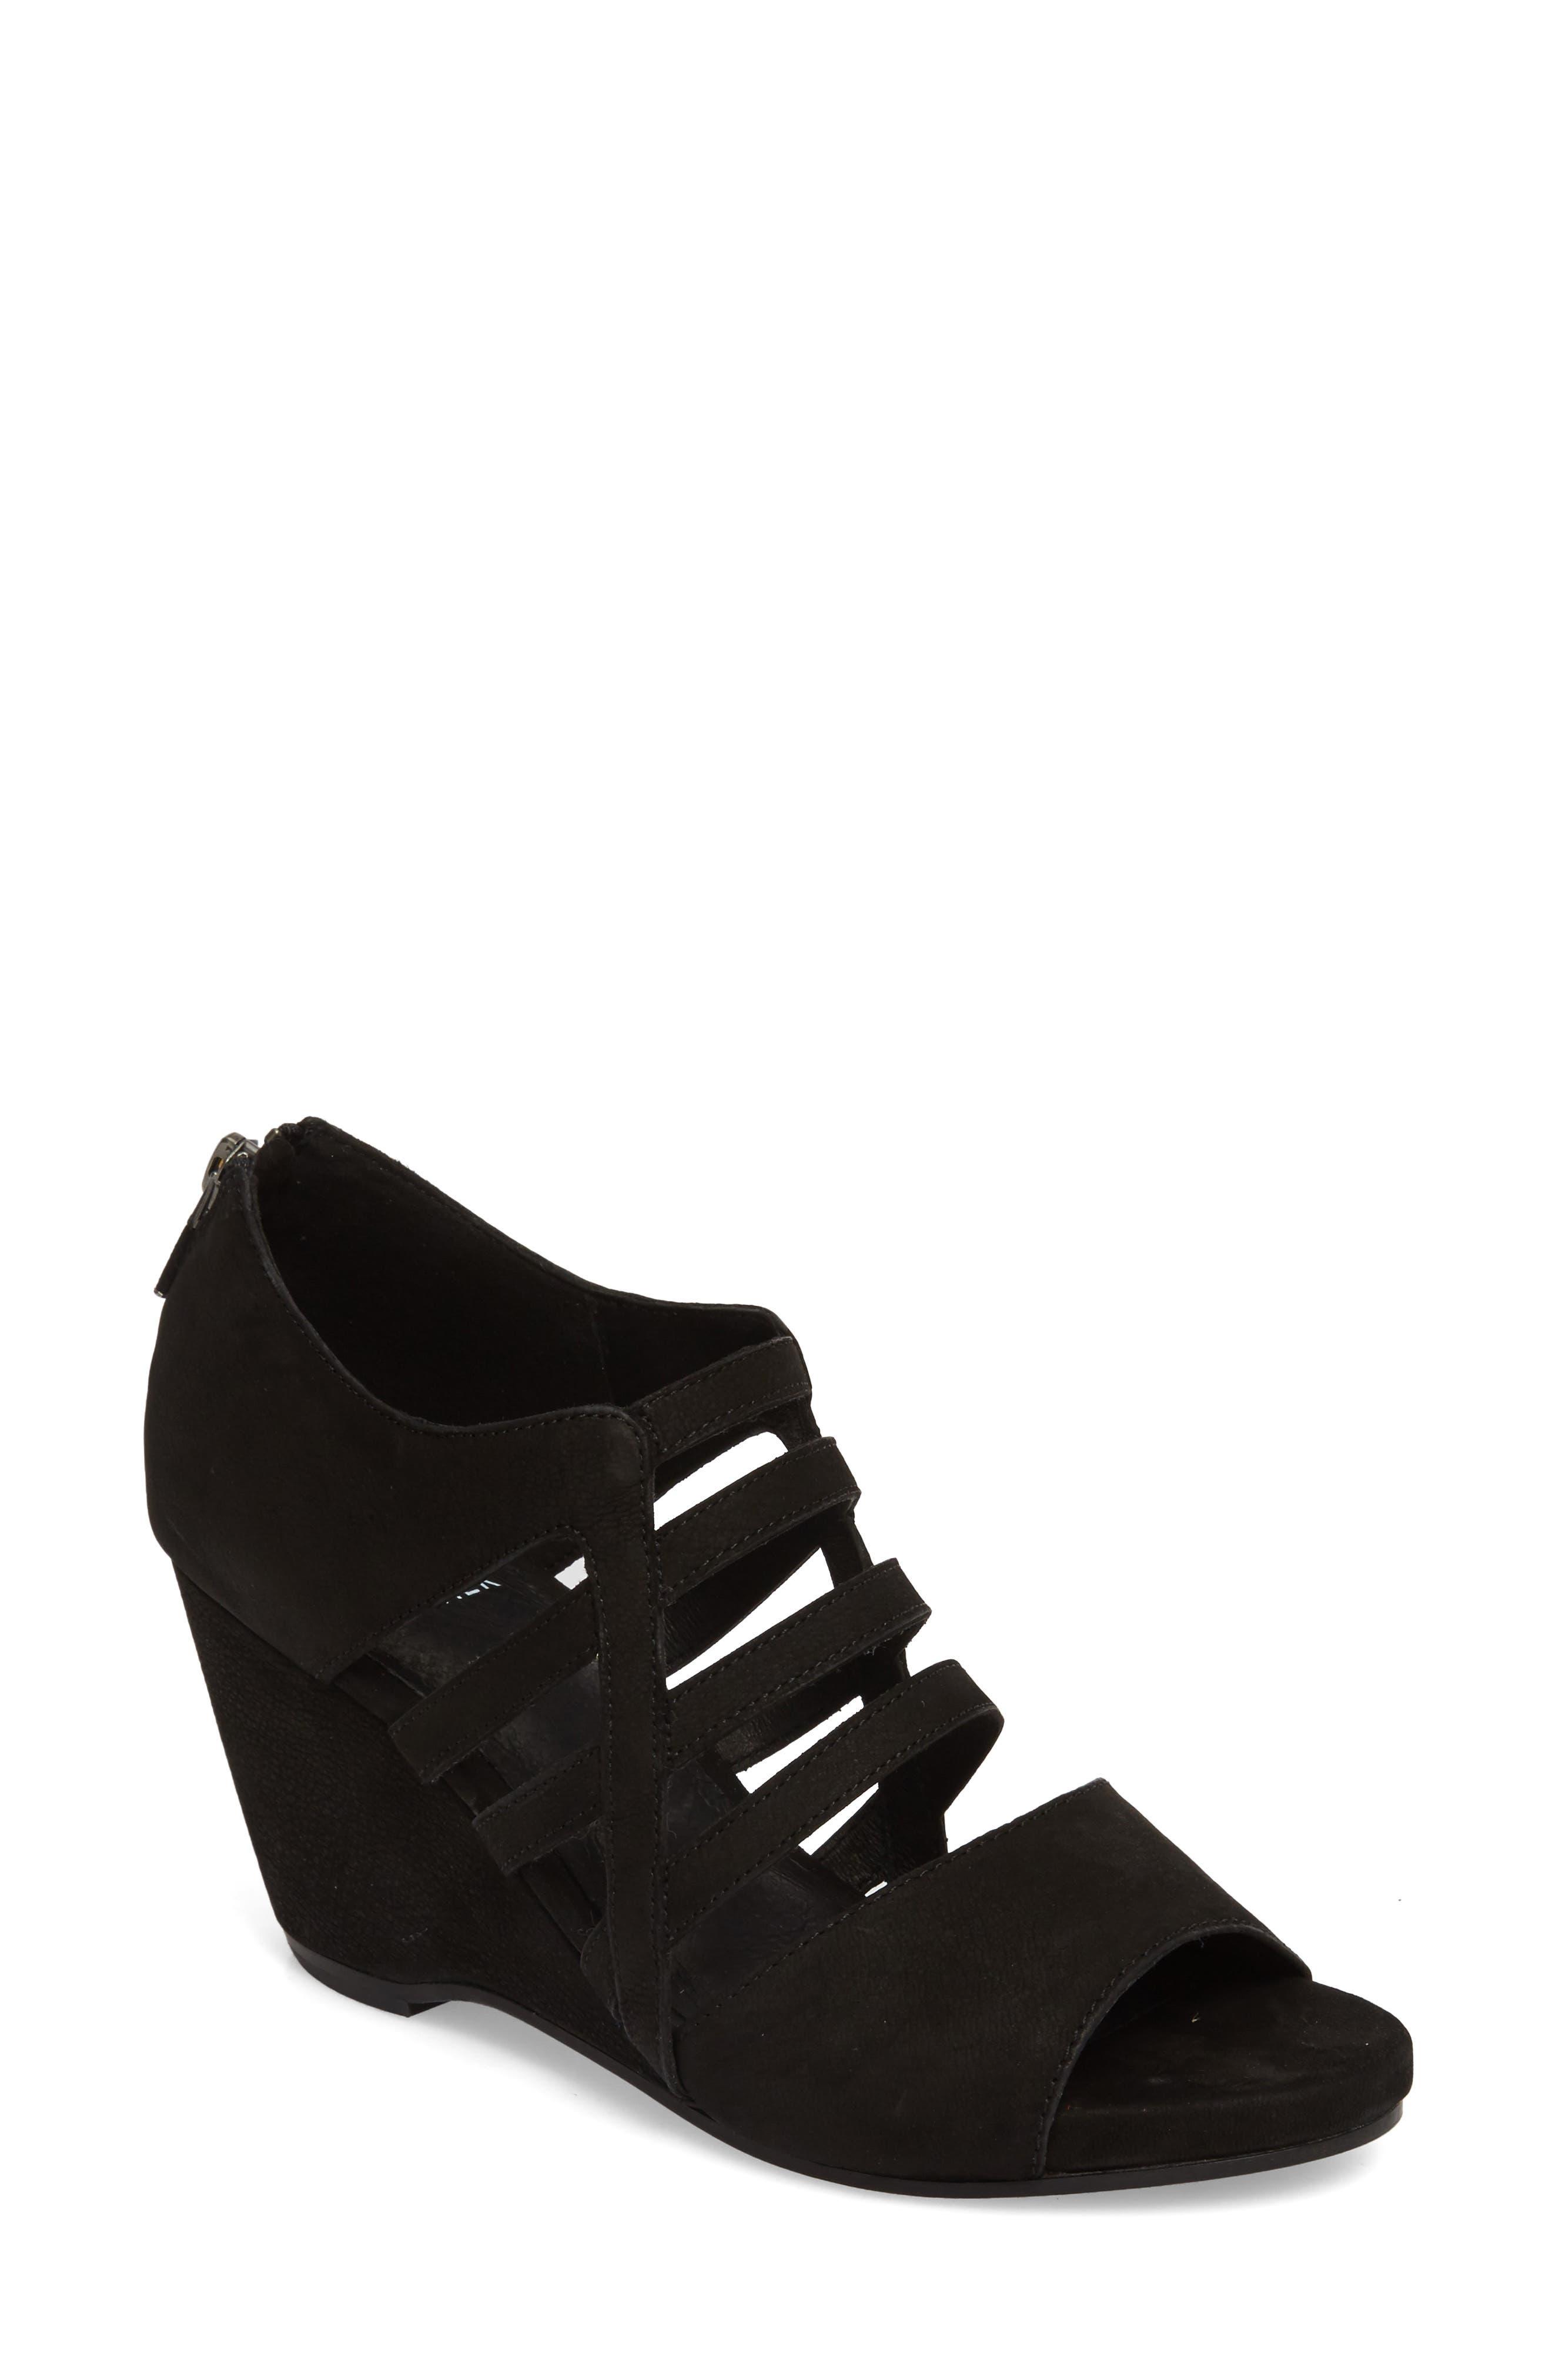 Dewey Wedge Sandal,                         Main,                         color, Black Nubuck